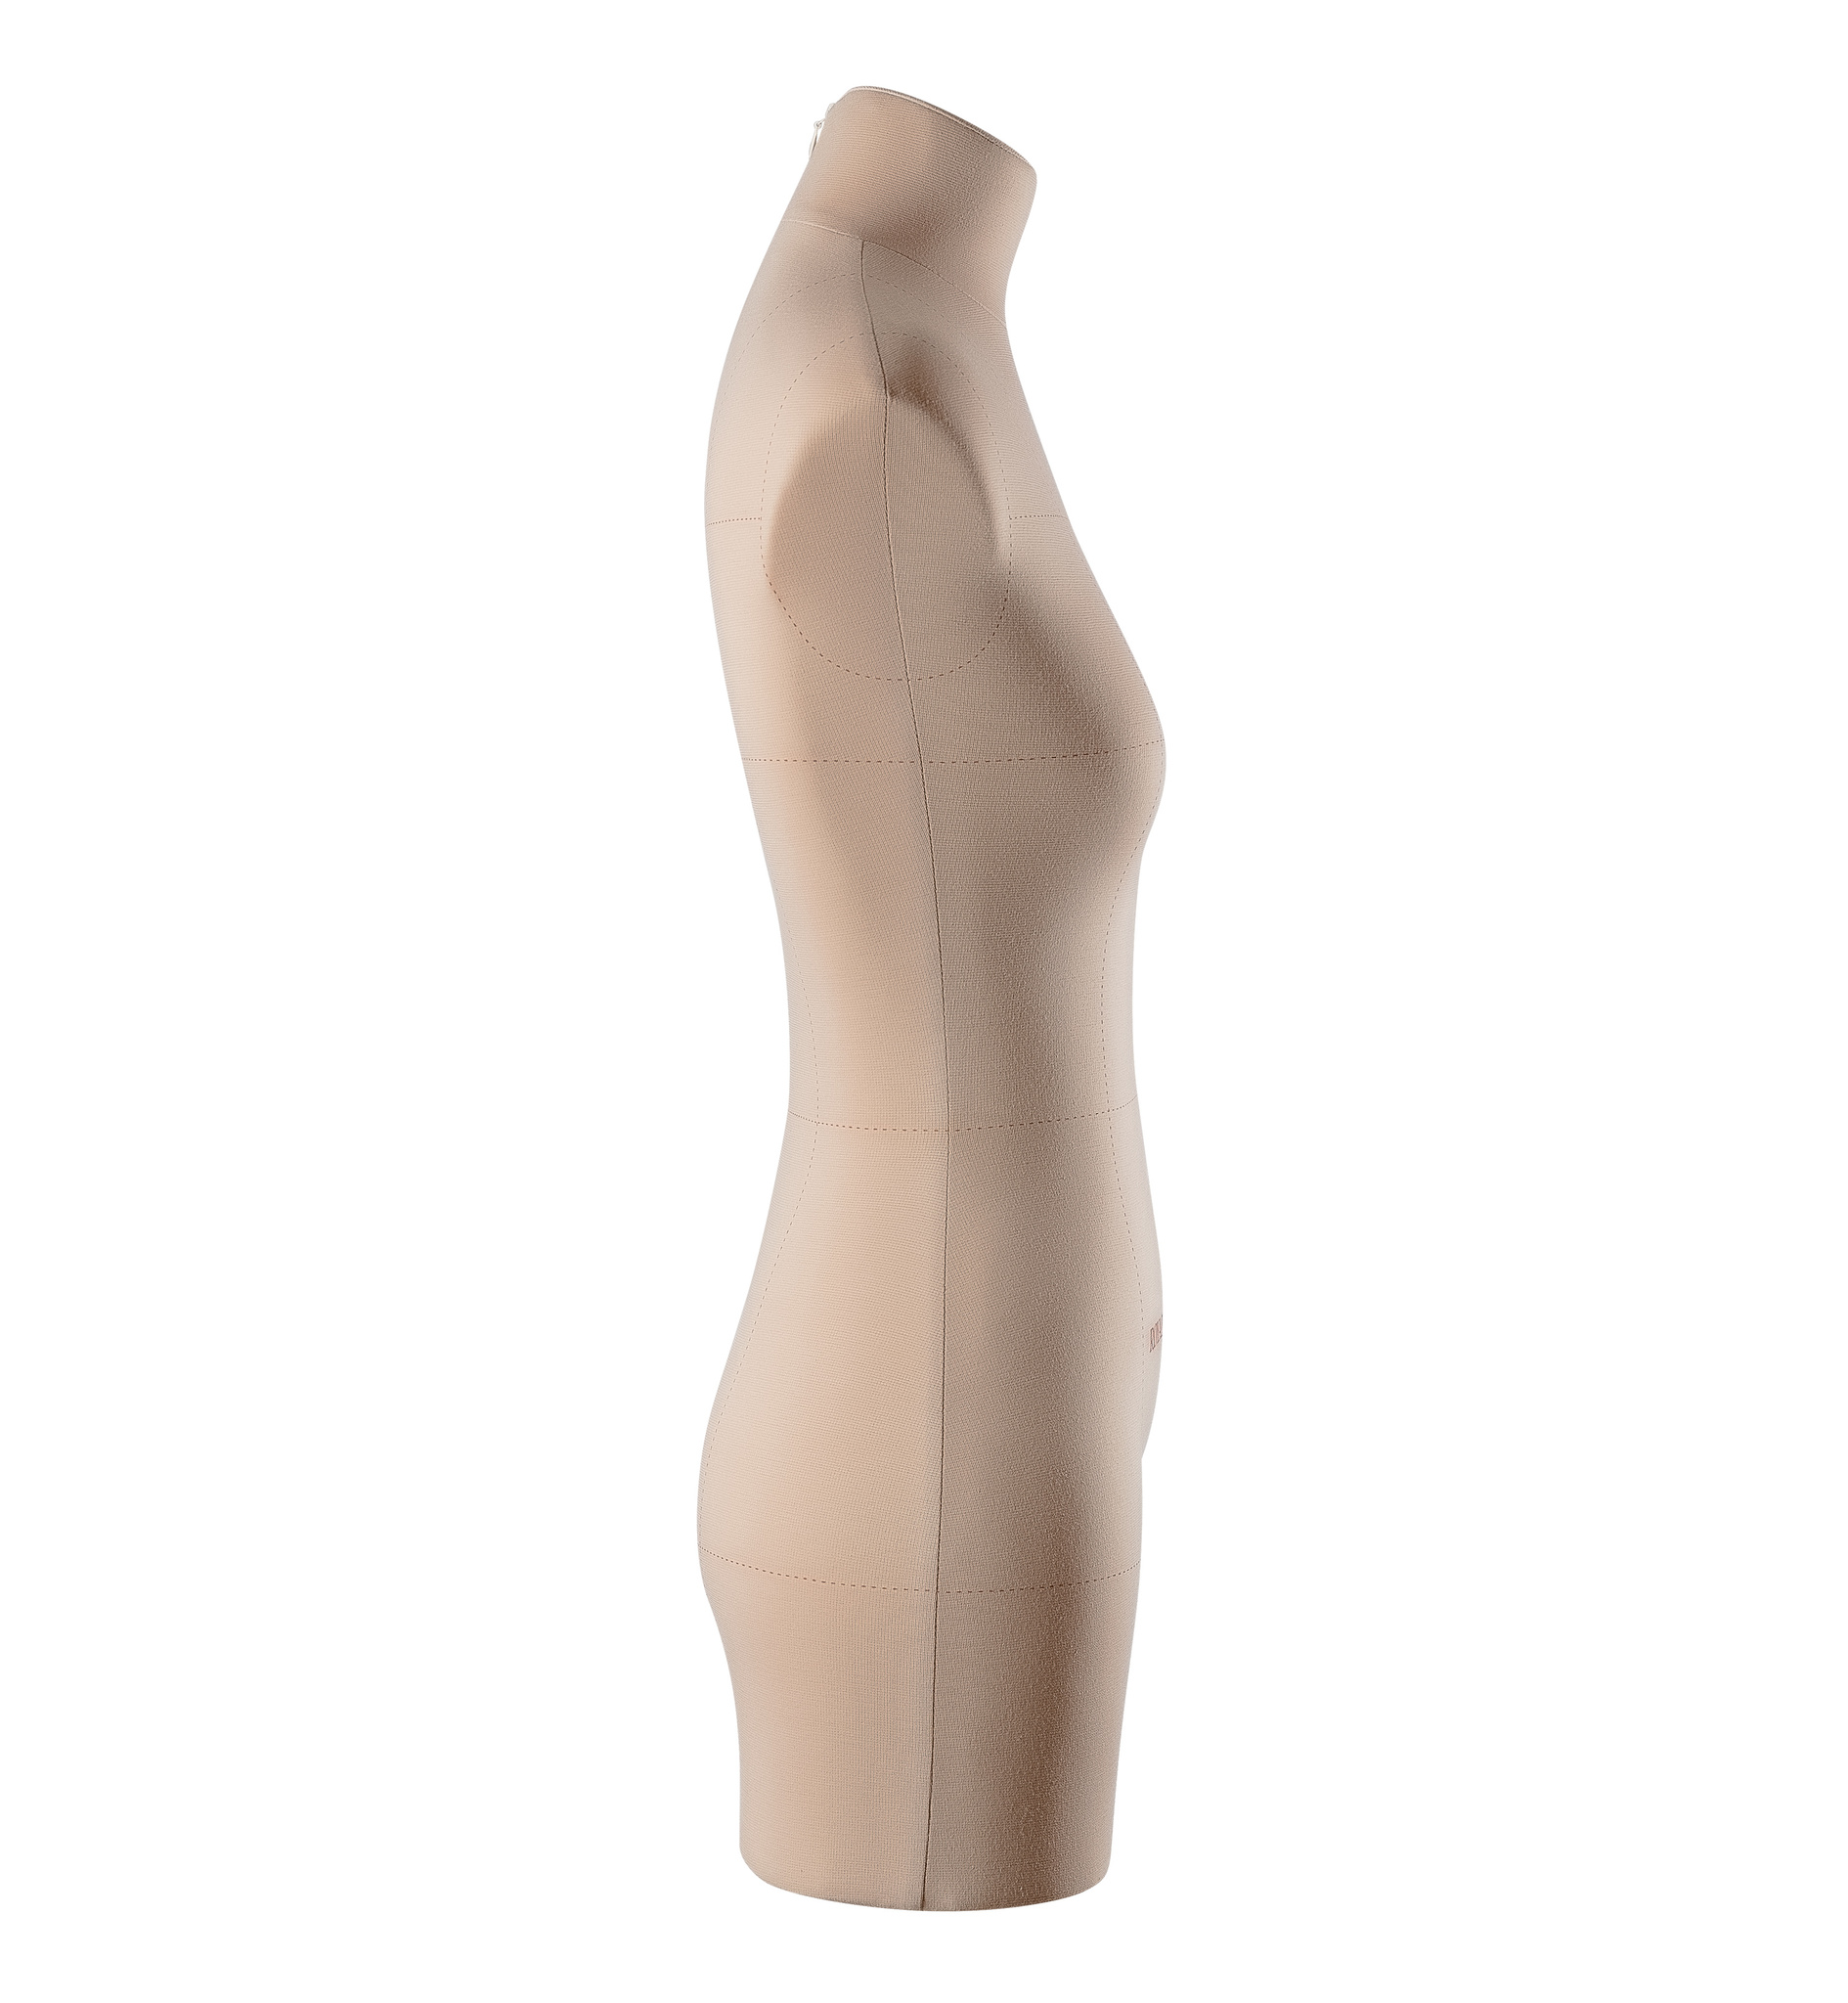 Манекен портновский Виктория, комплект Премиум, размер  40, БежевыйФото 3